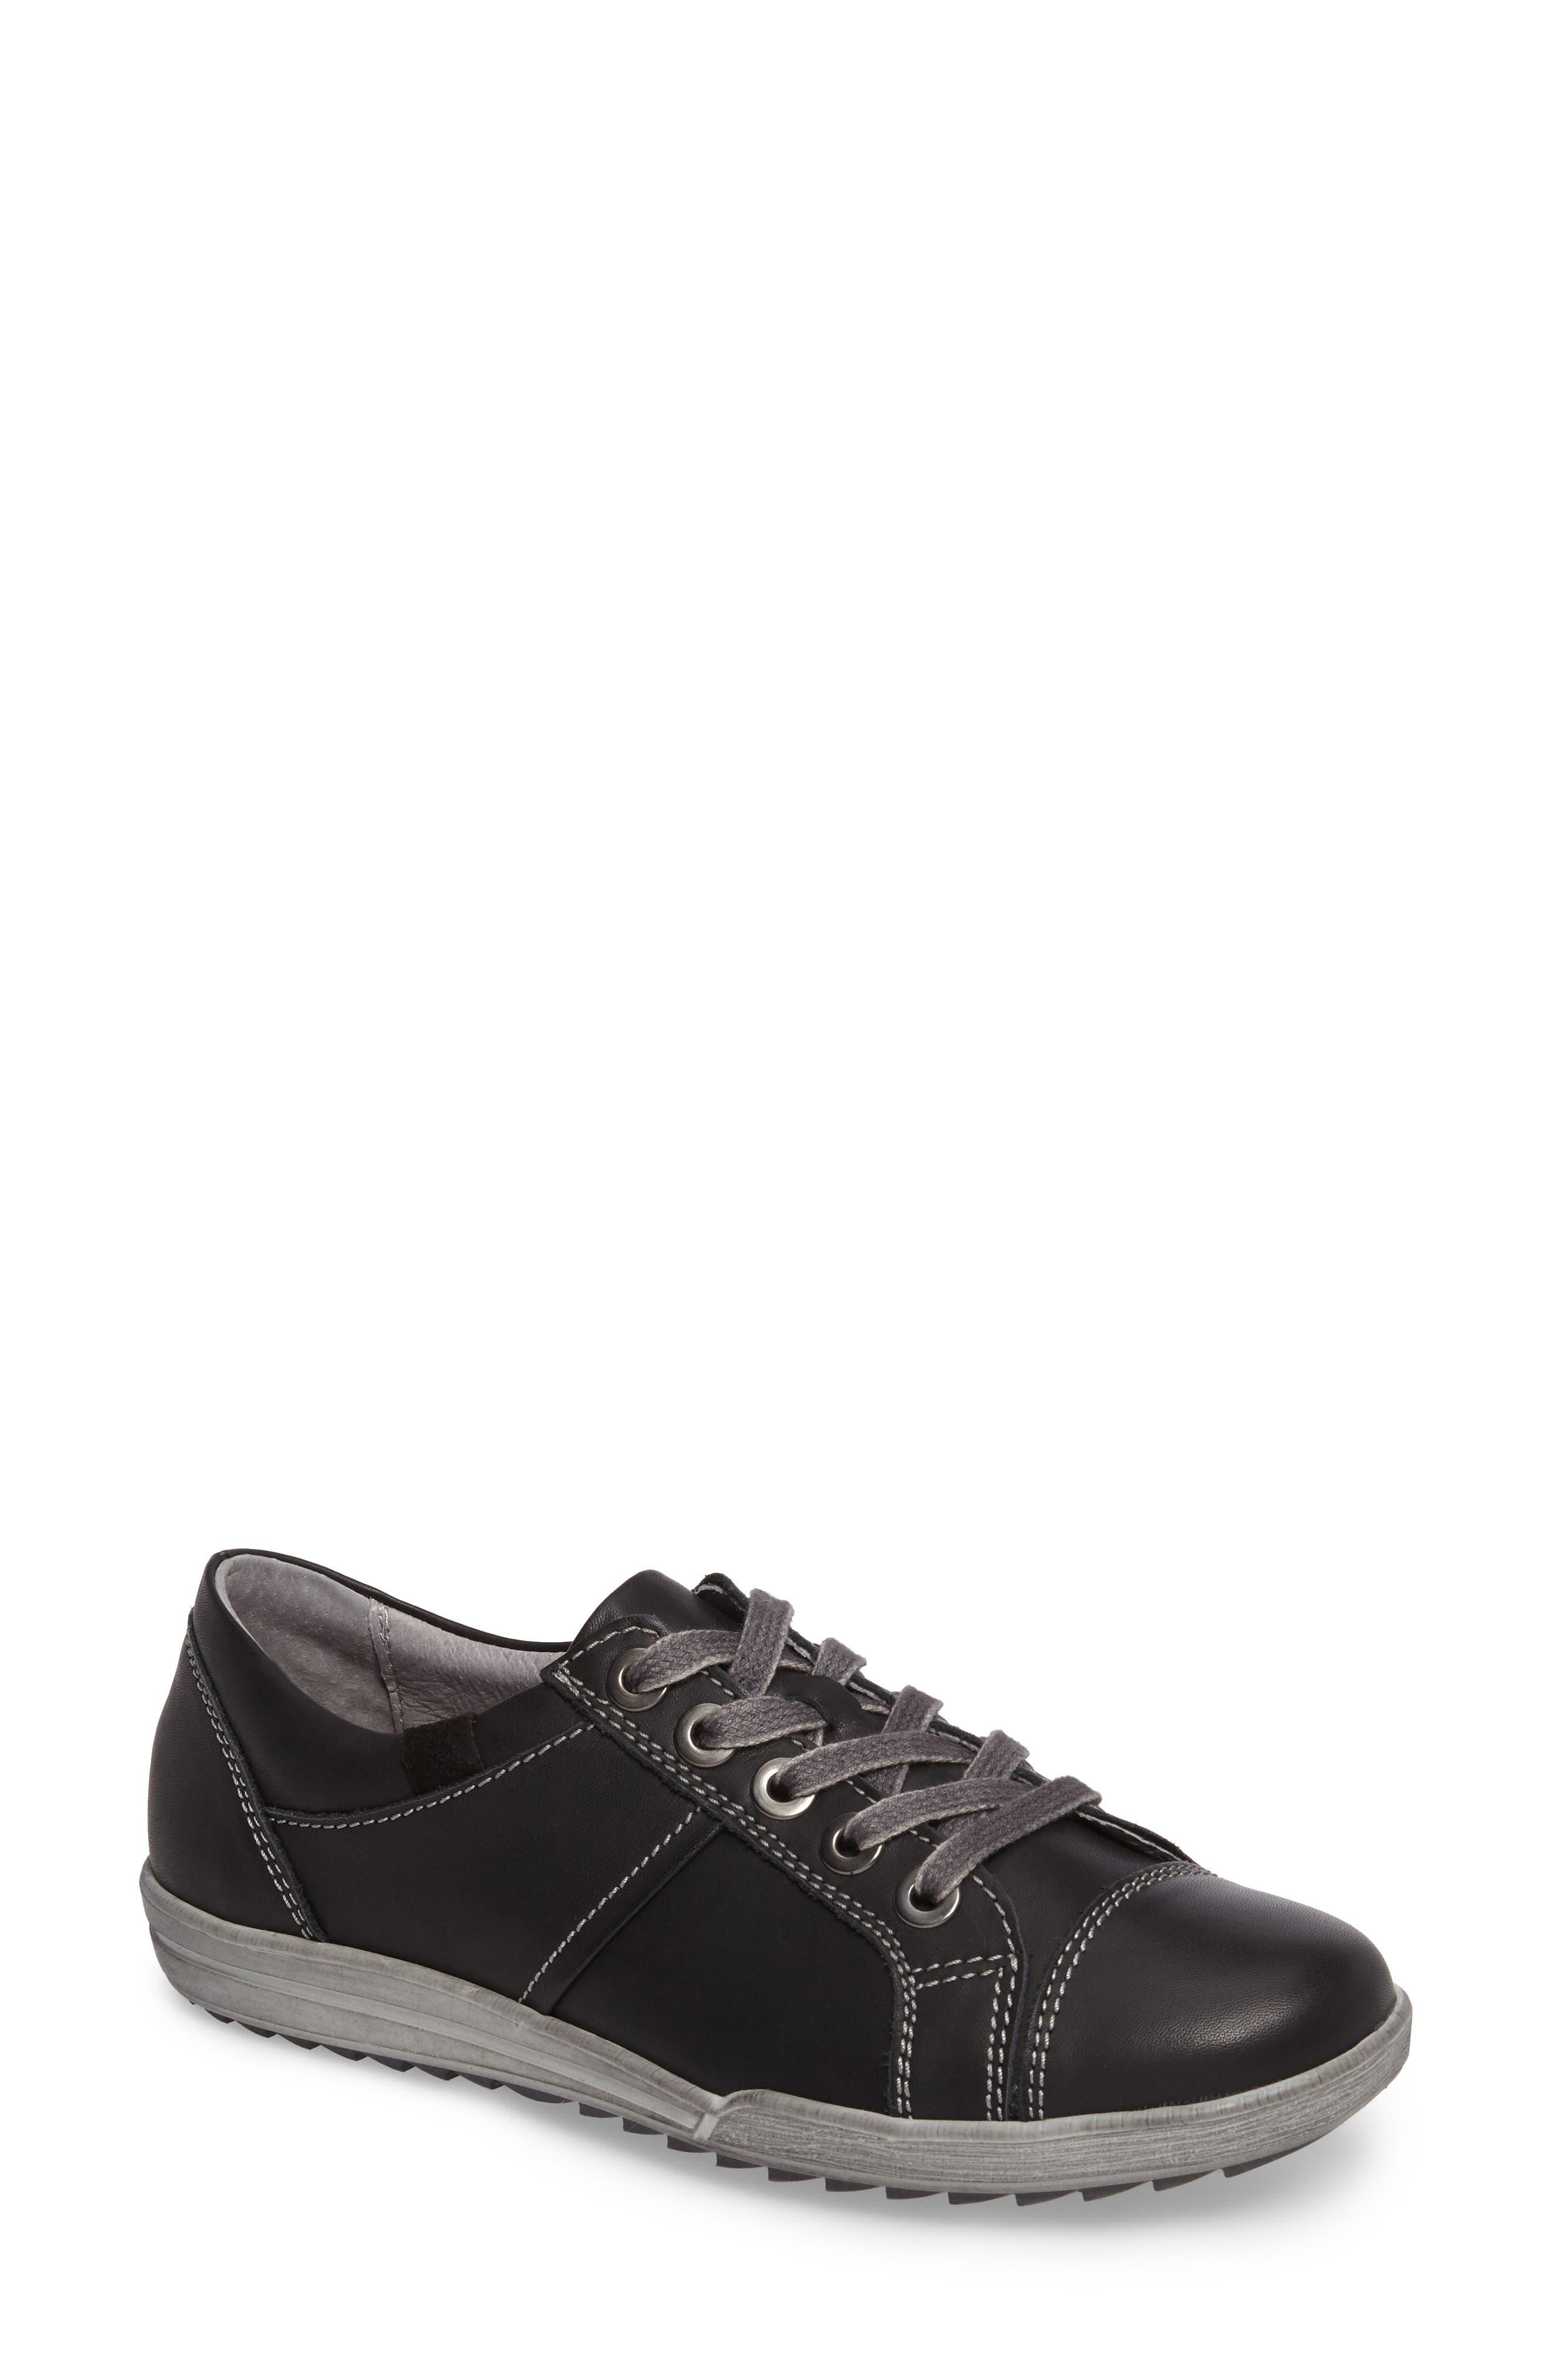 Dany 59 Sneaker,                         Main,                         color, 002